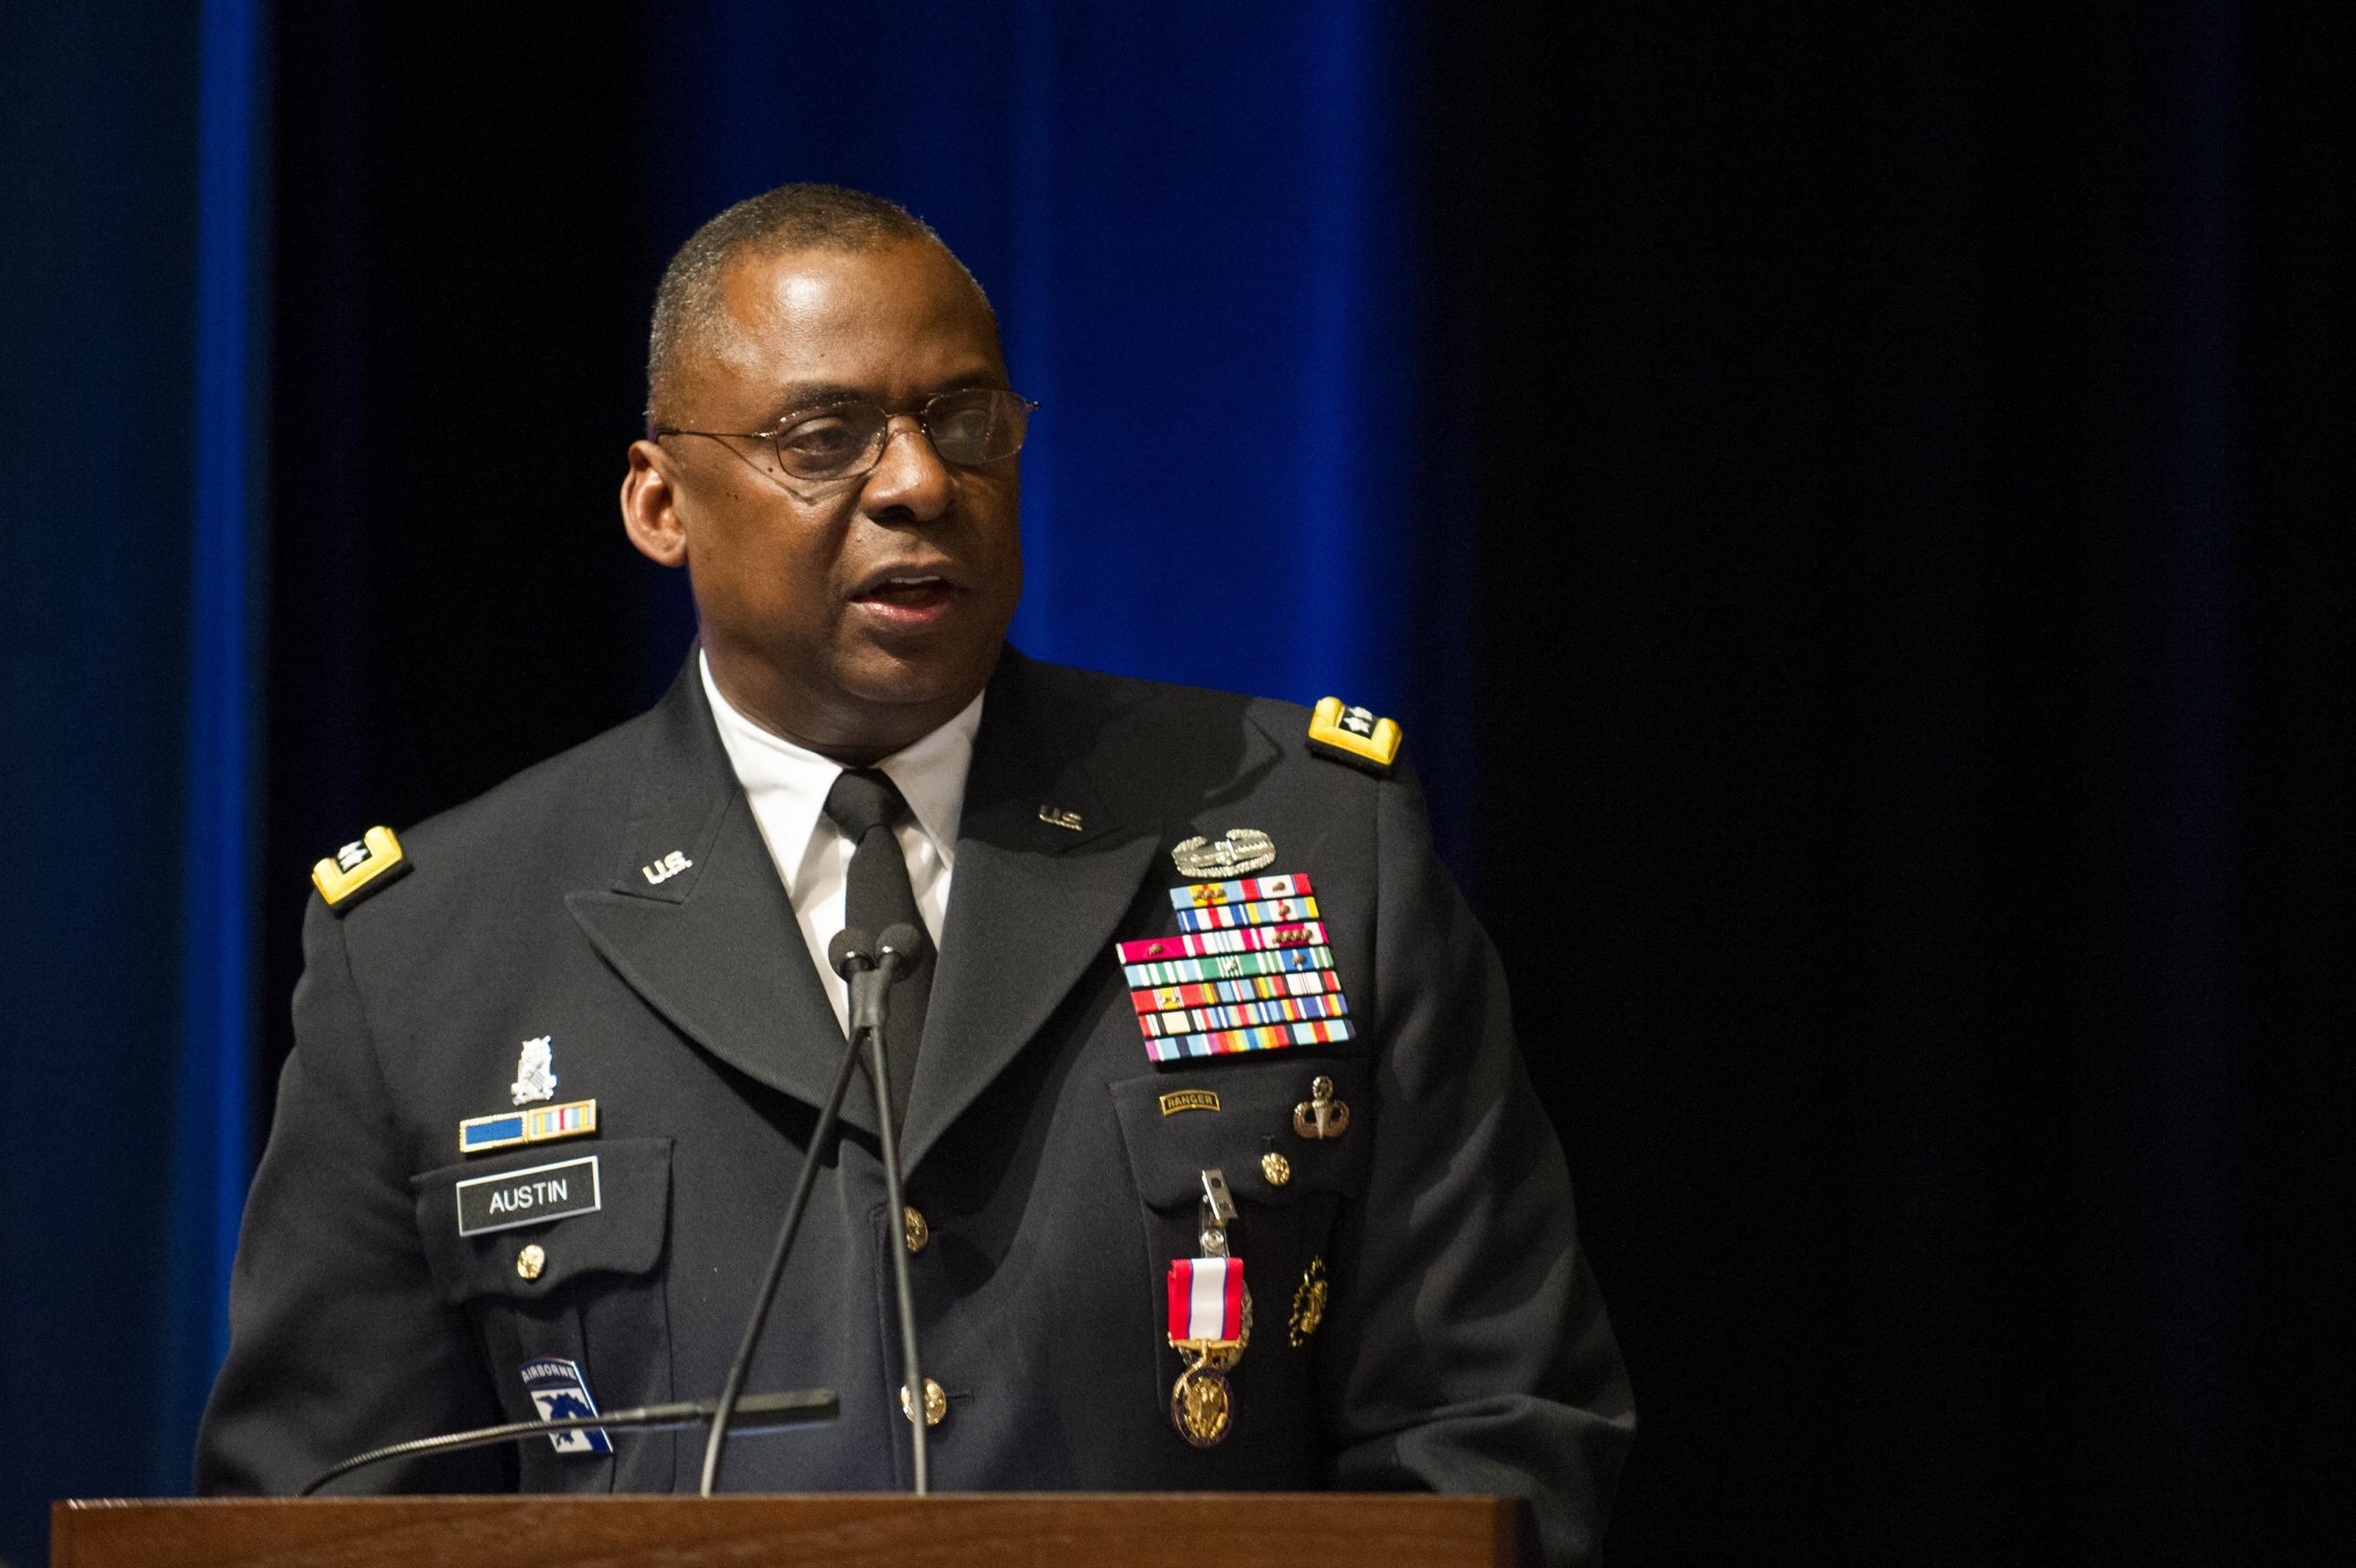 Farewell Ceremony In Honor Of Gen. LLoyd Austin